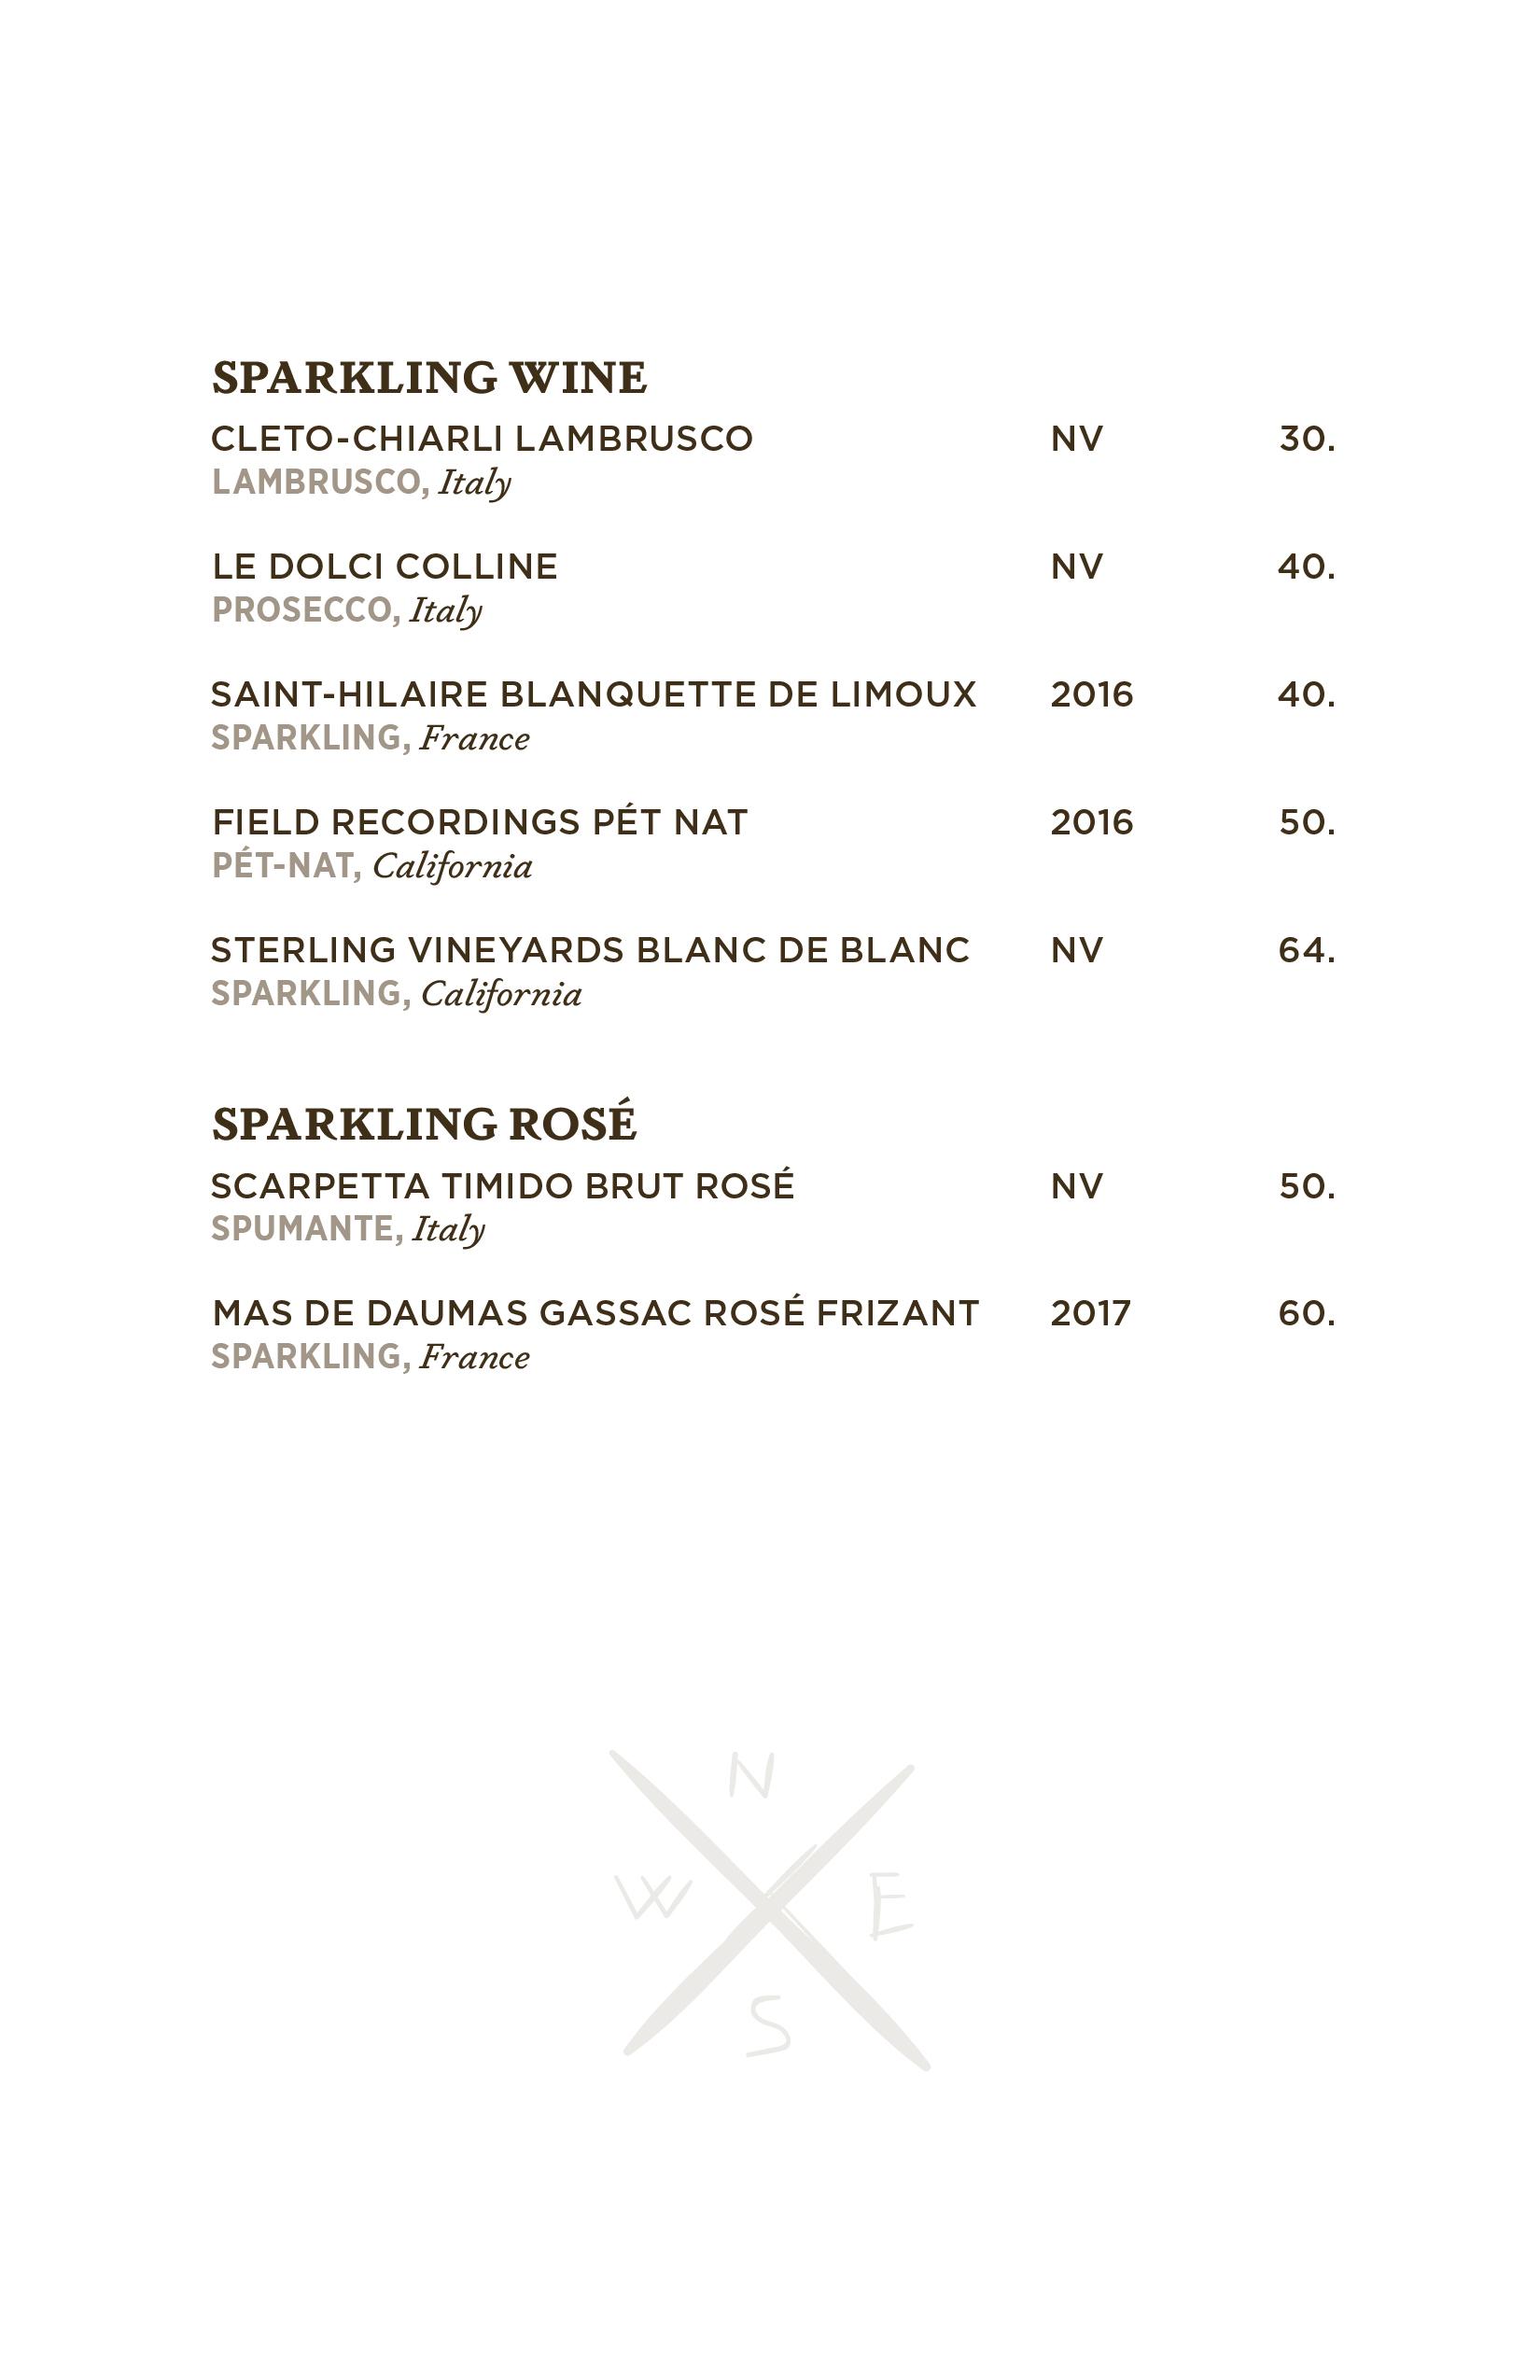 11.21.18 S&S Drink Book wine list 2